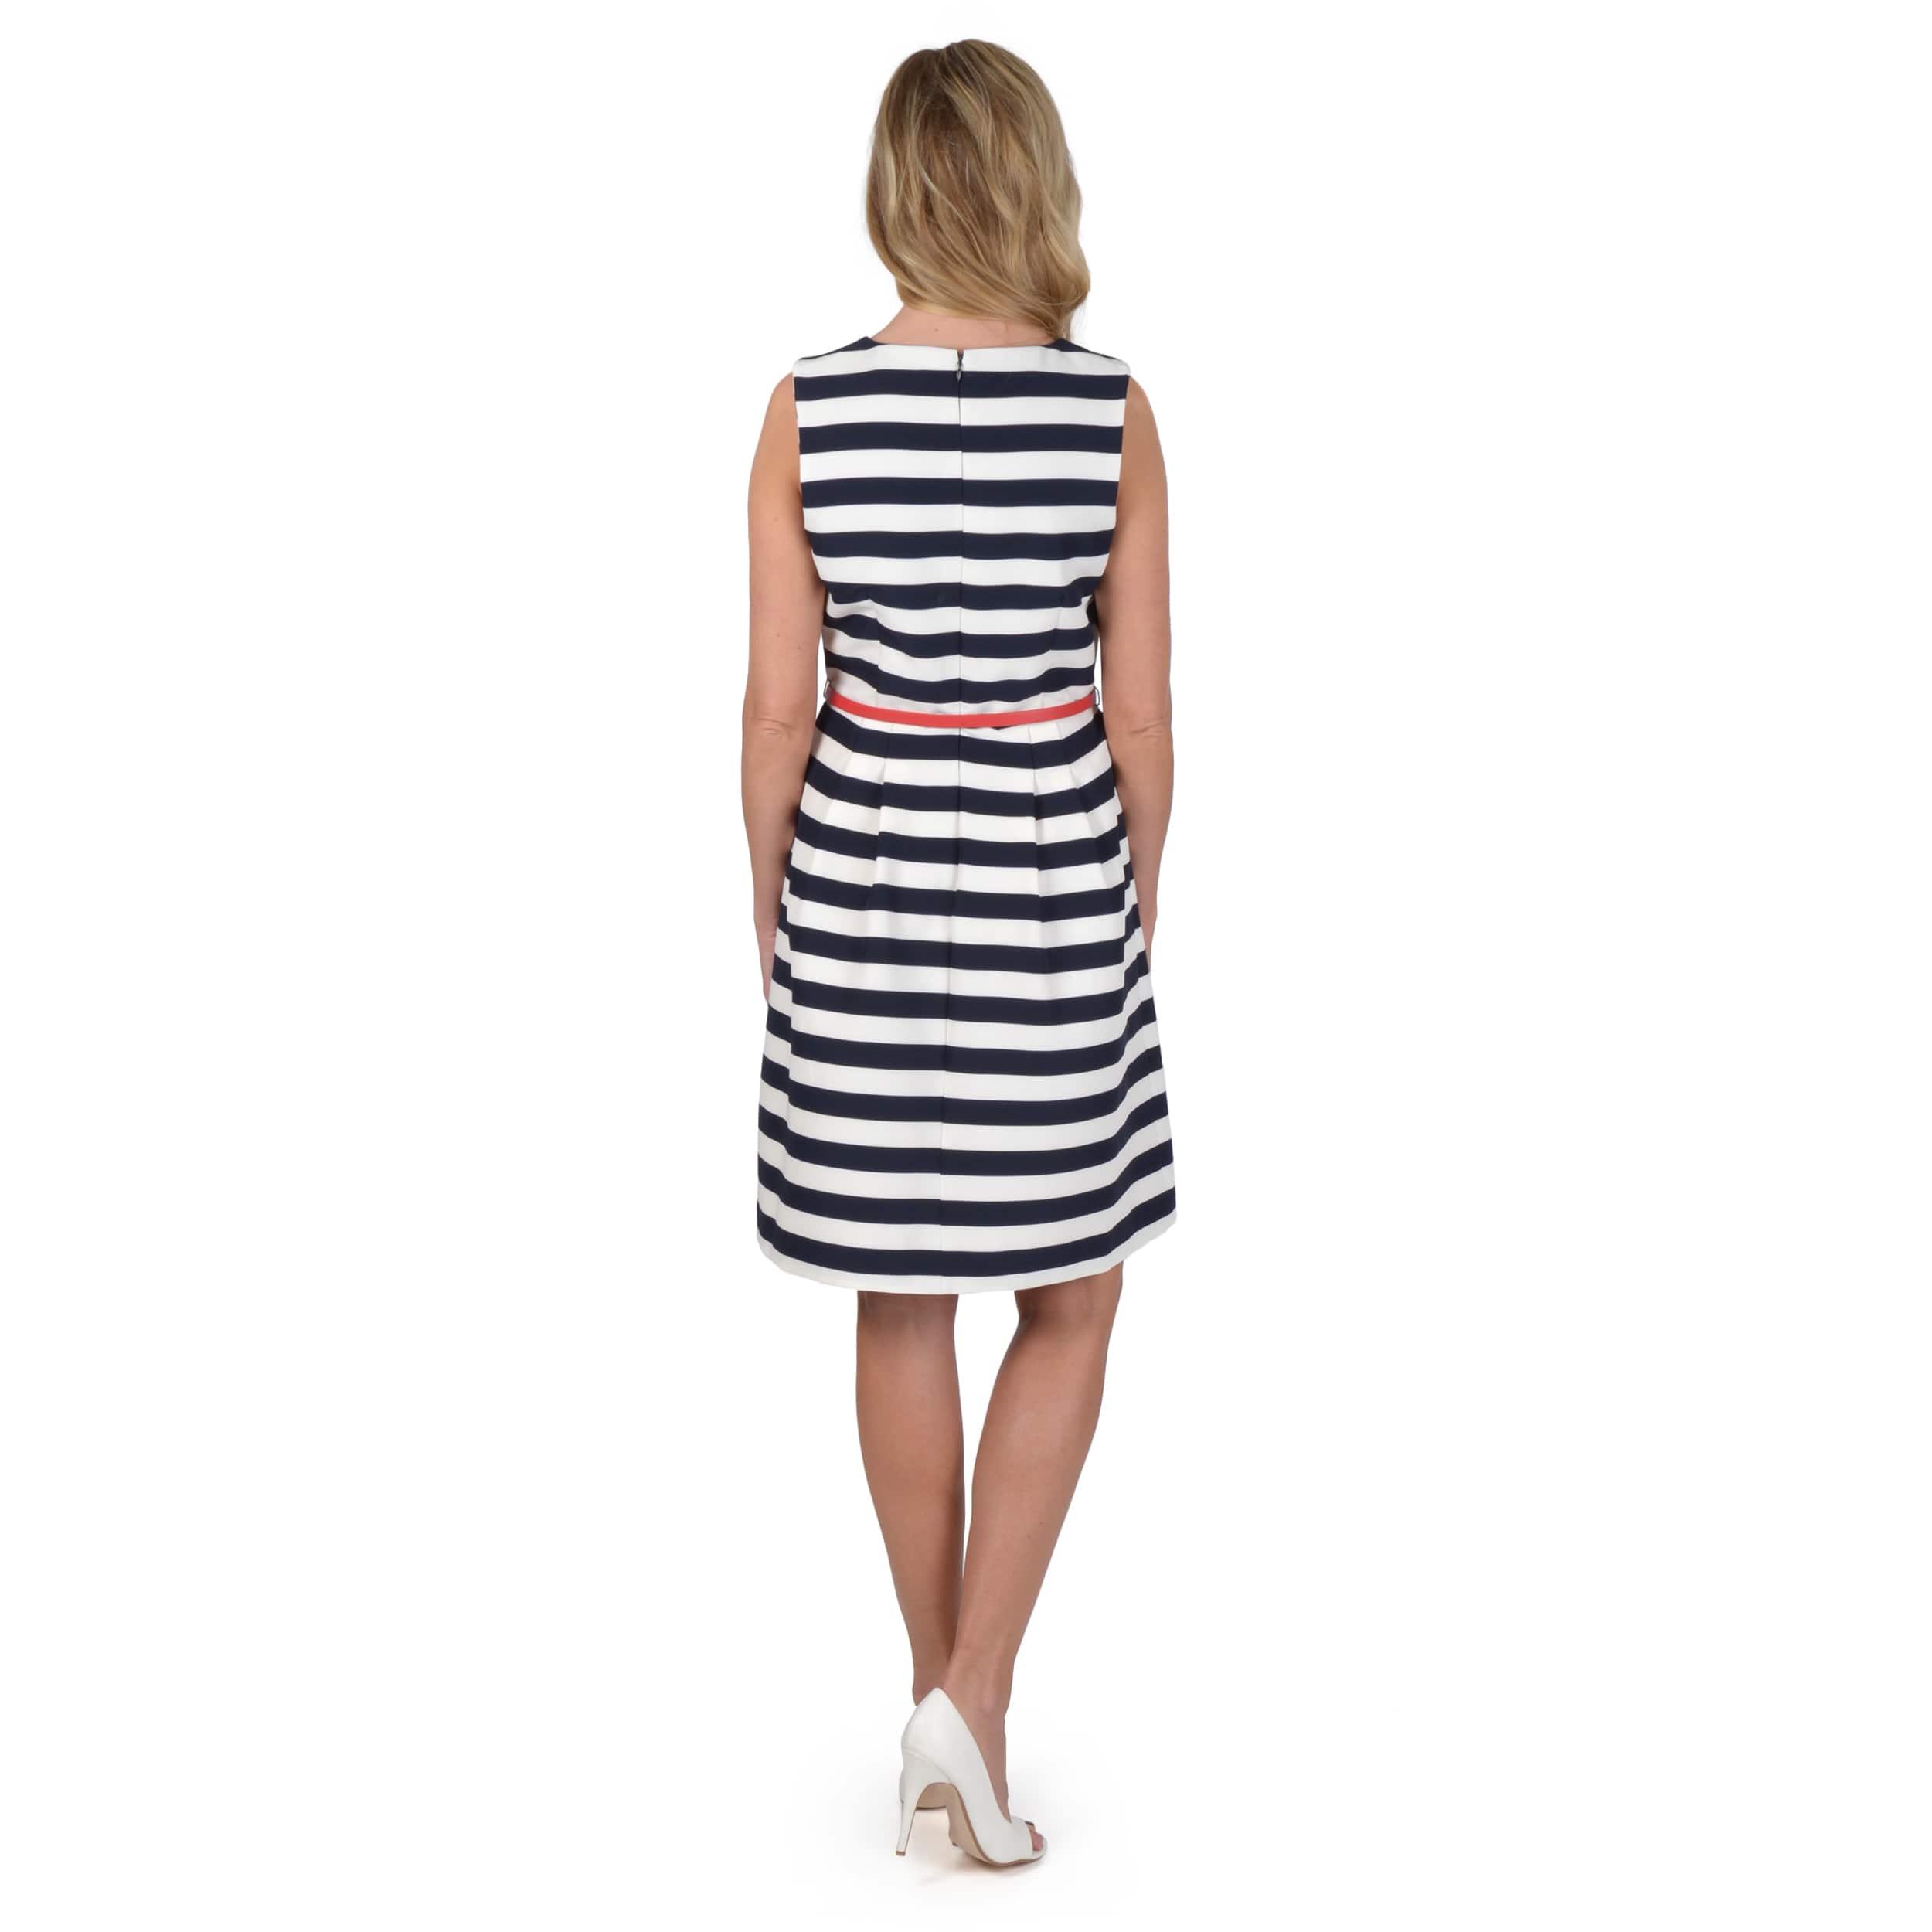 Shelby & Palmer Women's Belted Sleeveless Dress